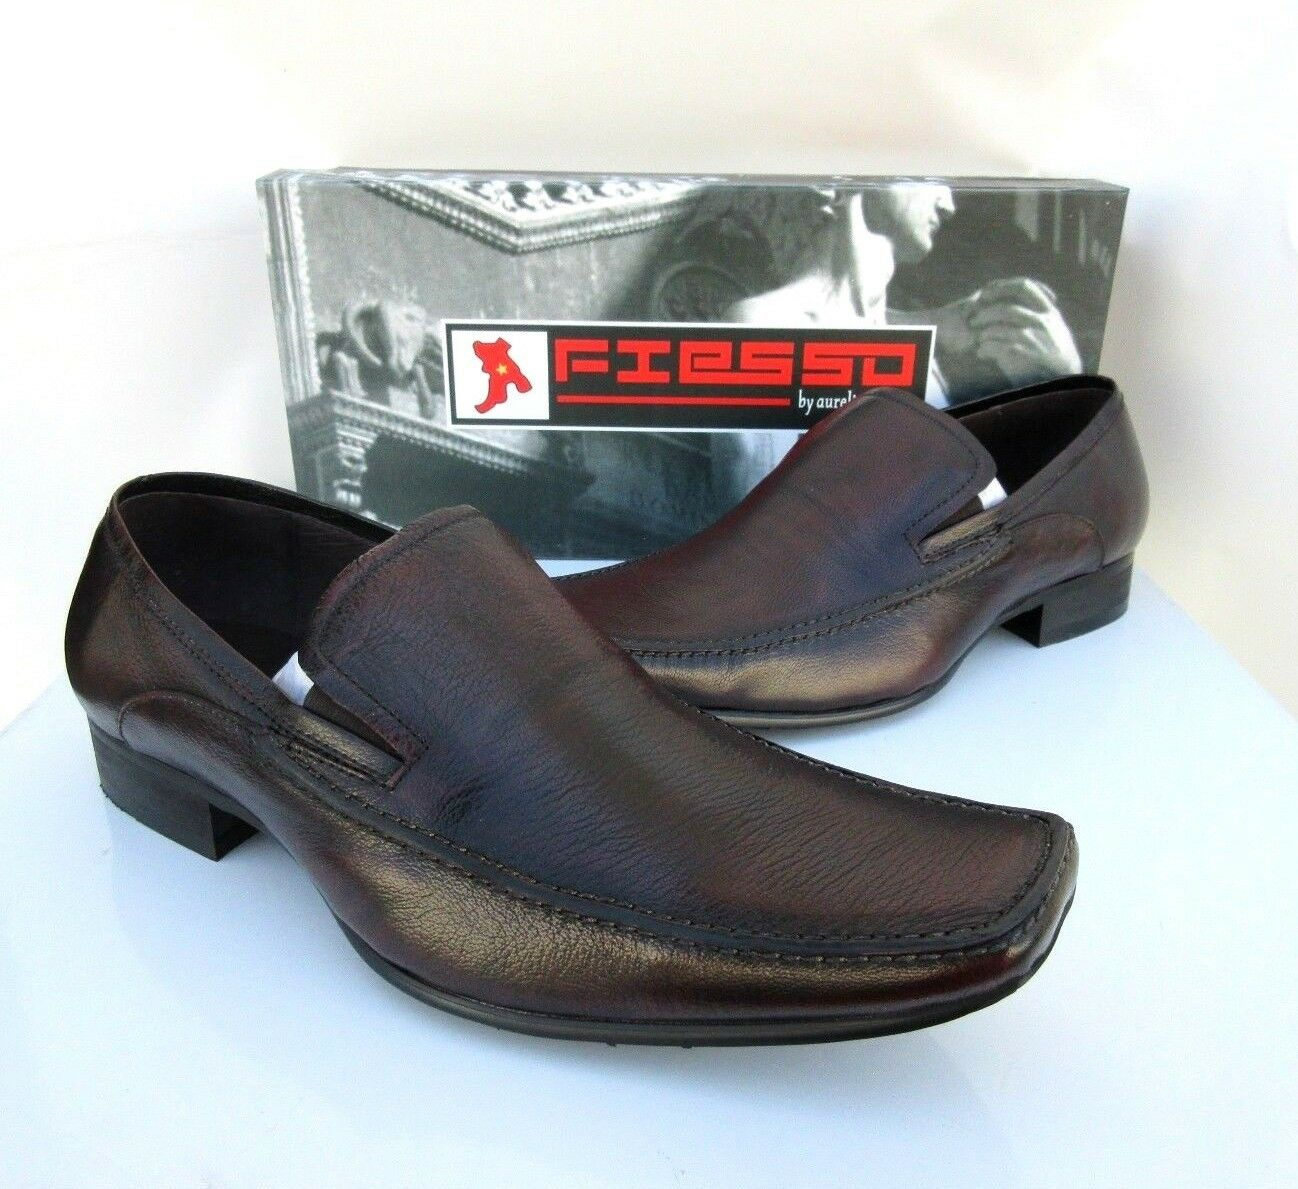 NEW Fiesso Aurelio Leder Garcia  Uomo Marroon Leder Aurelio Loafer Schuhes Style FI-6248 Sz 10 122753